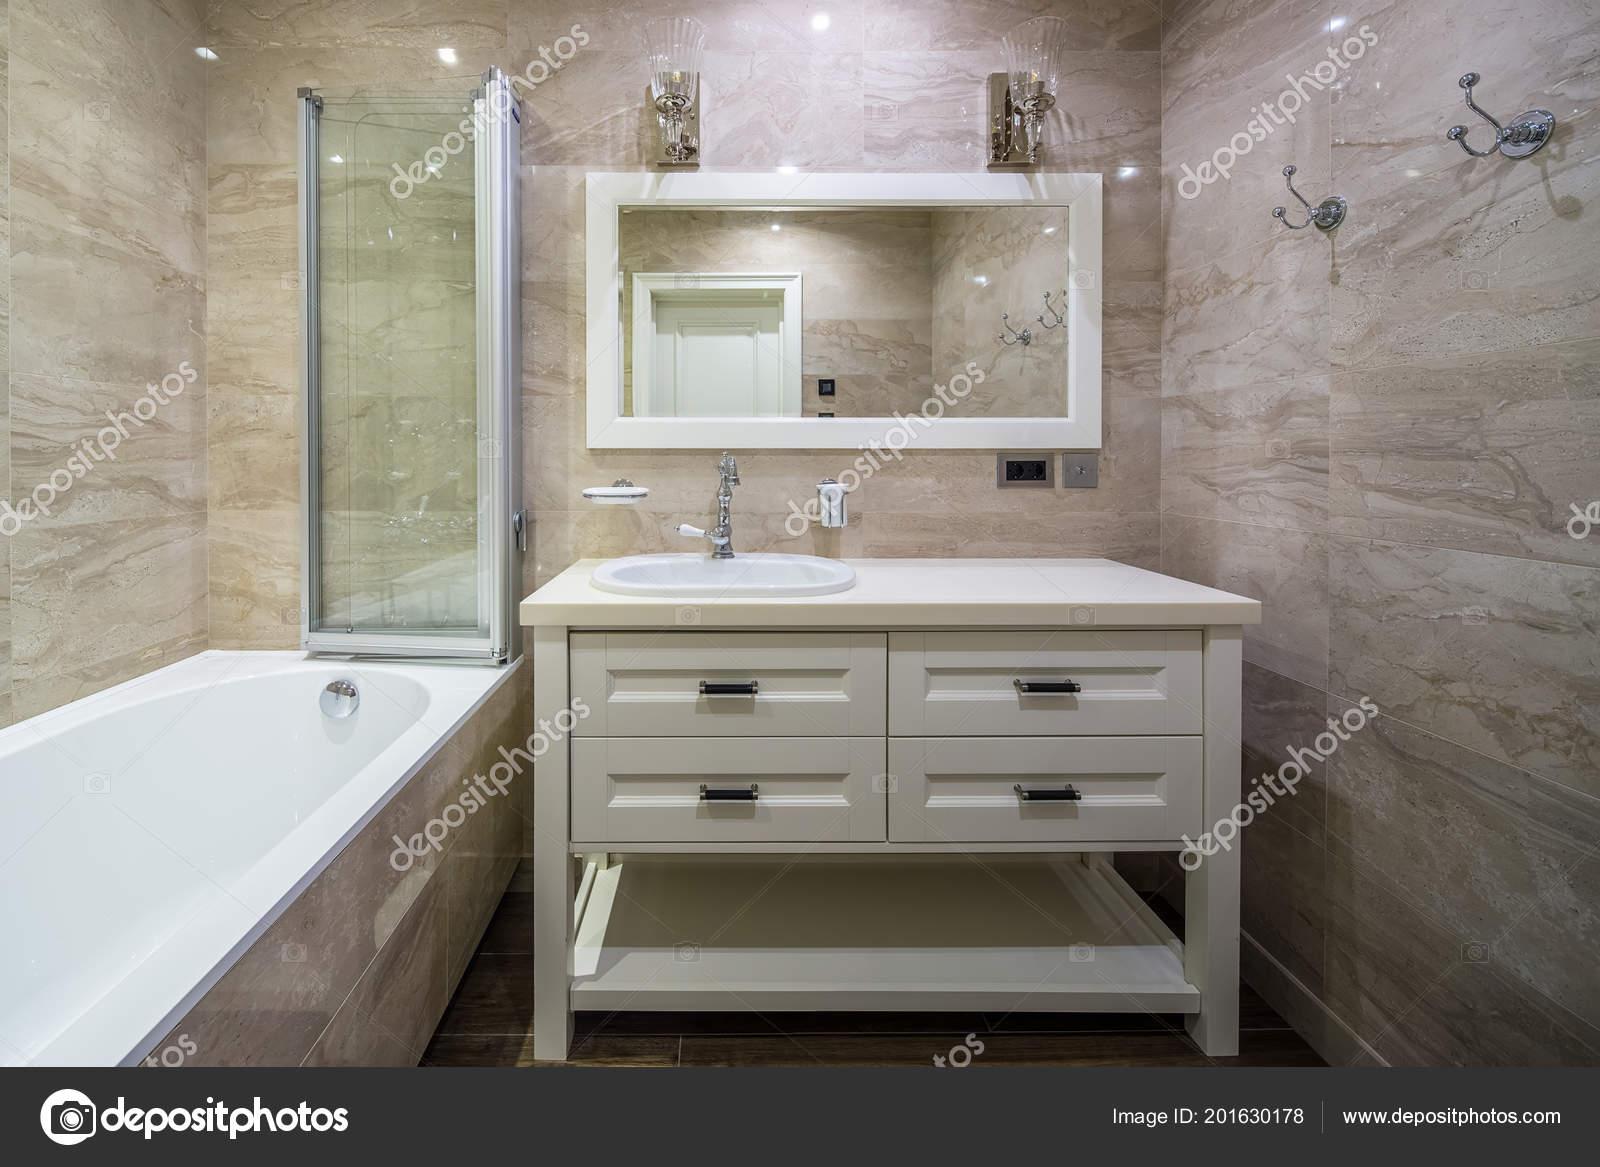 Cuarto de baño en estilo clásico — Foto de stock © bezikus #201630178